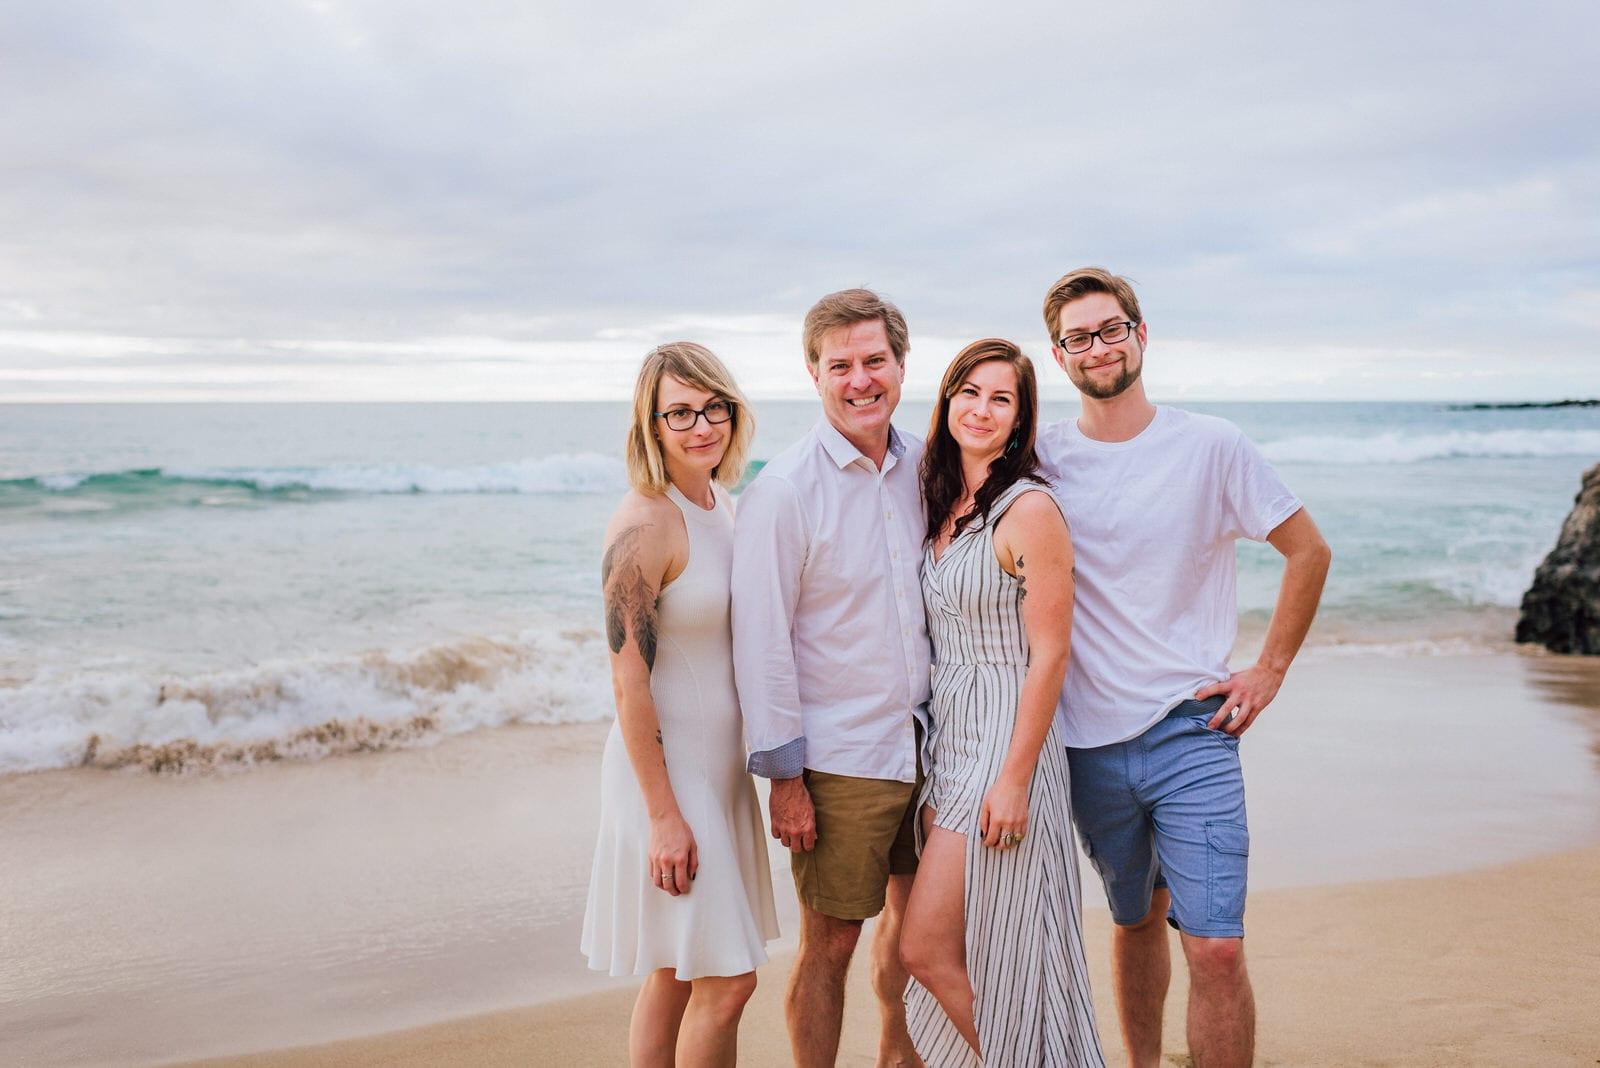 Hawaii-Family-Photographer-Hapuna-Beach-7.jpg